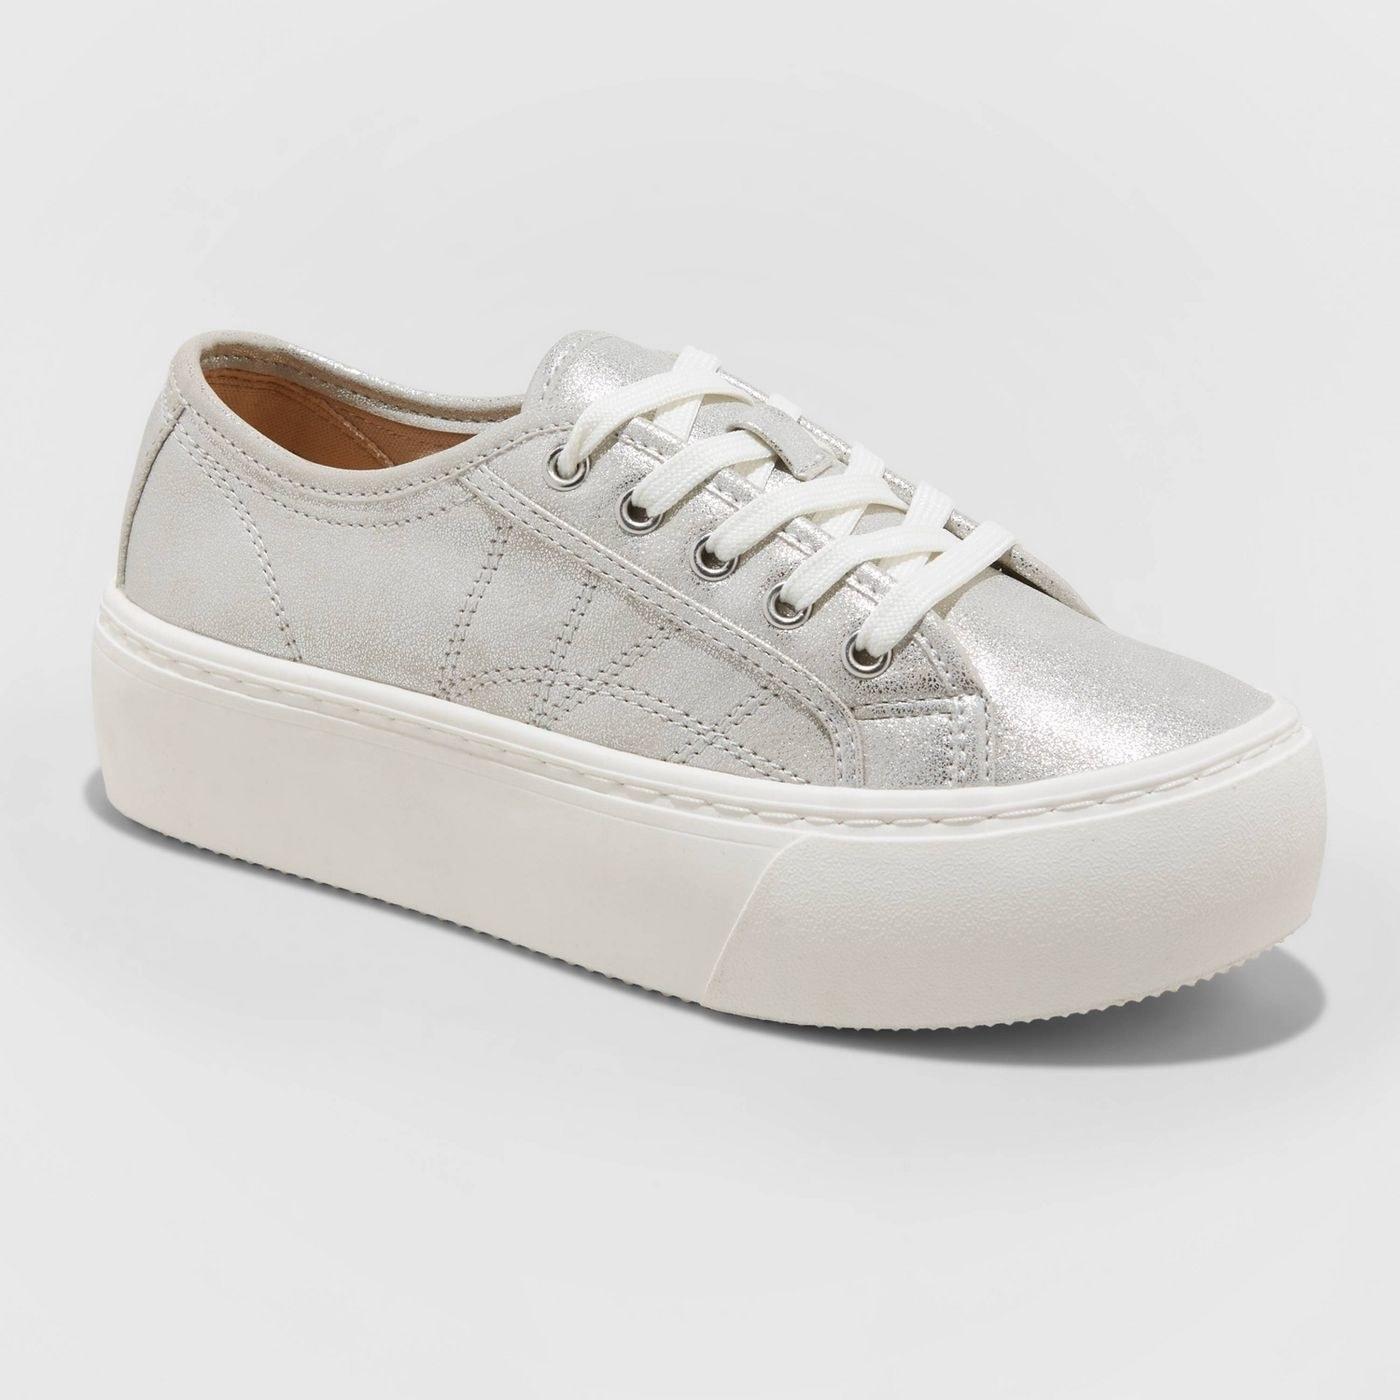 silver metallic platform lace-up sneakers